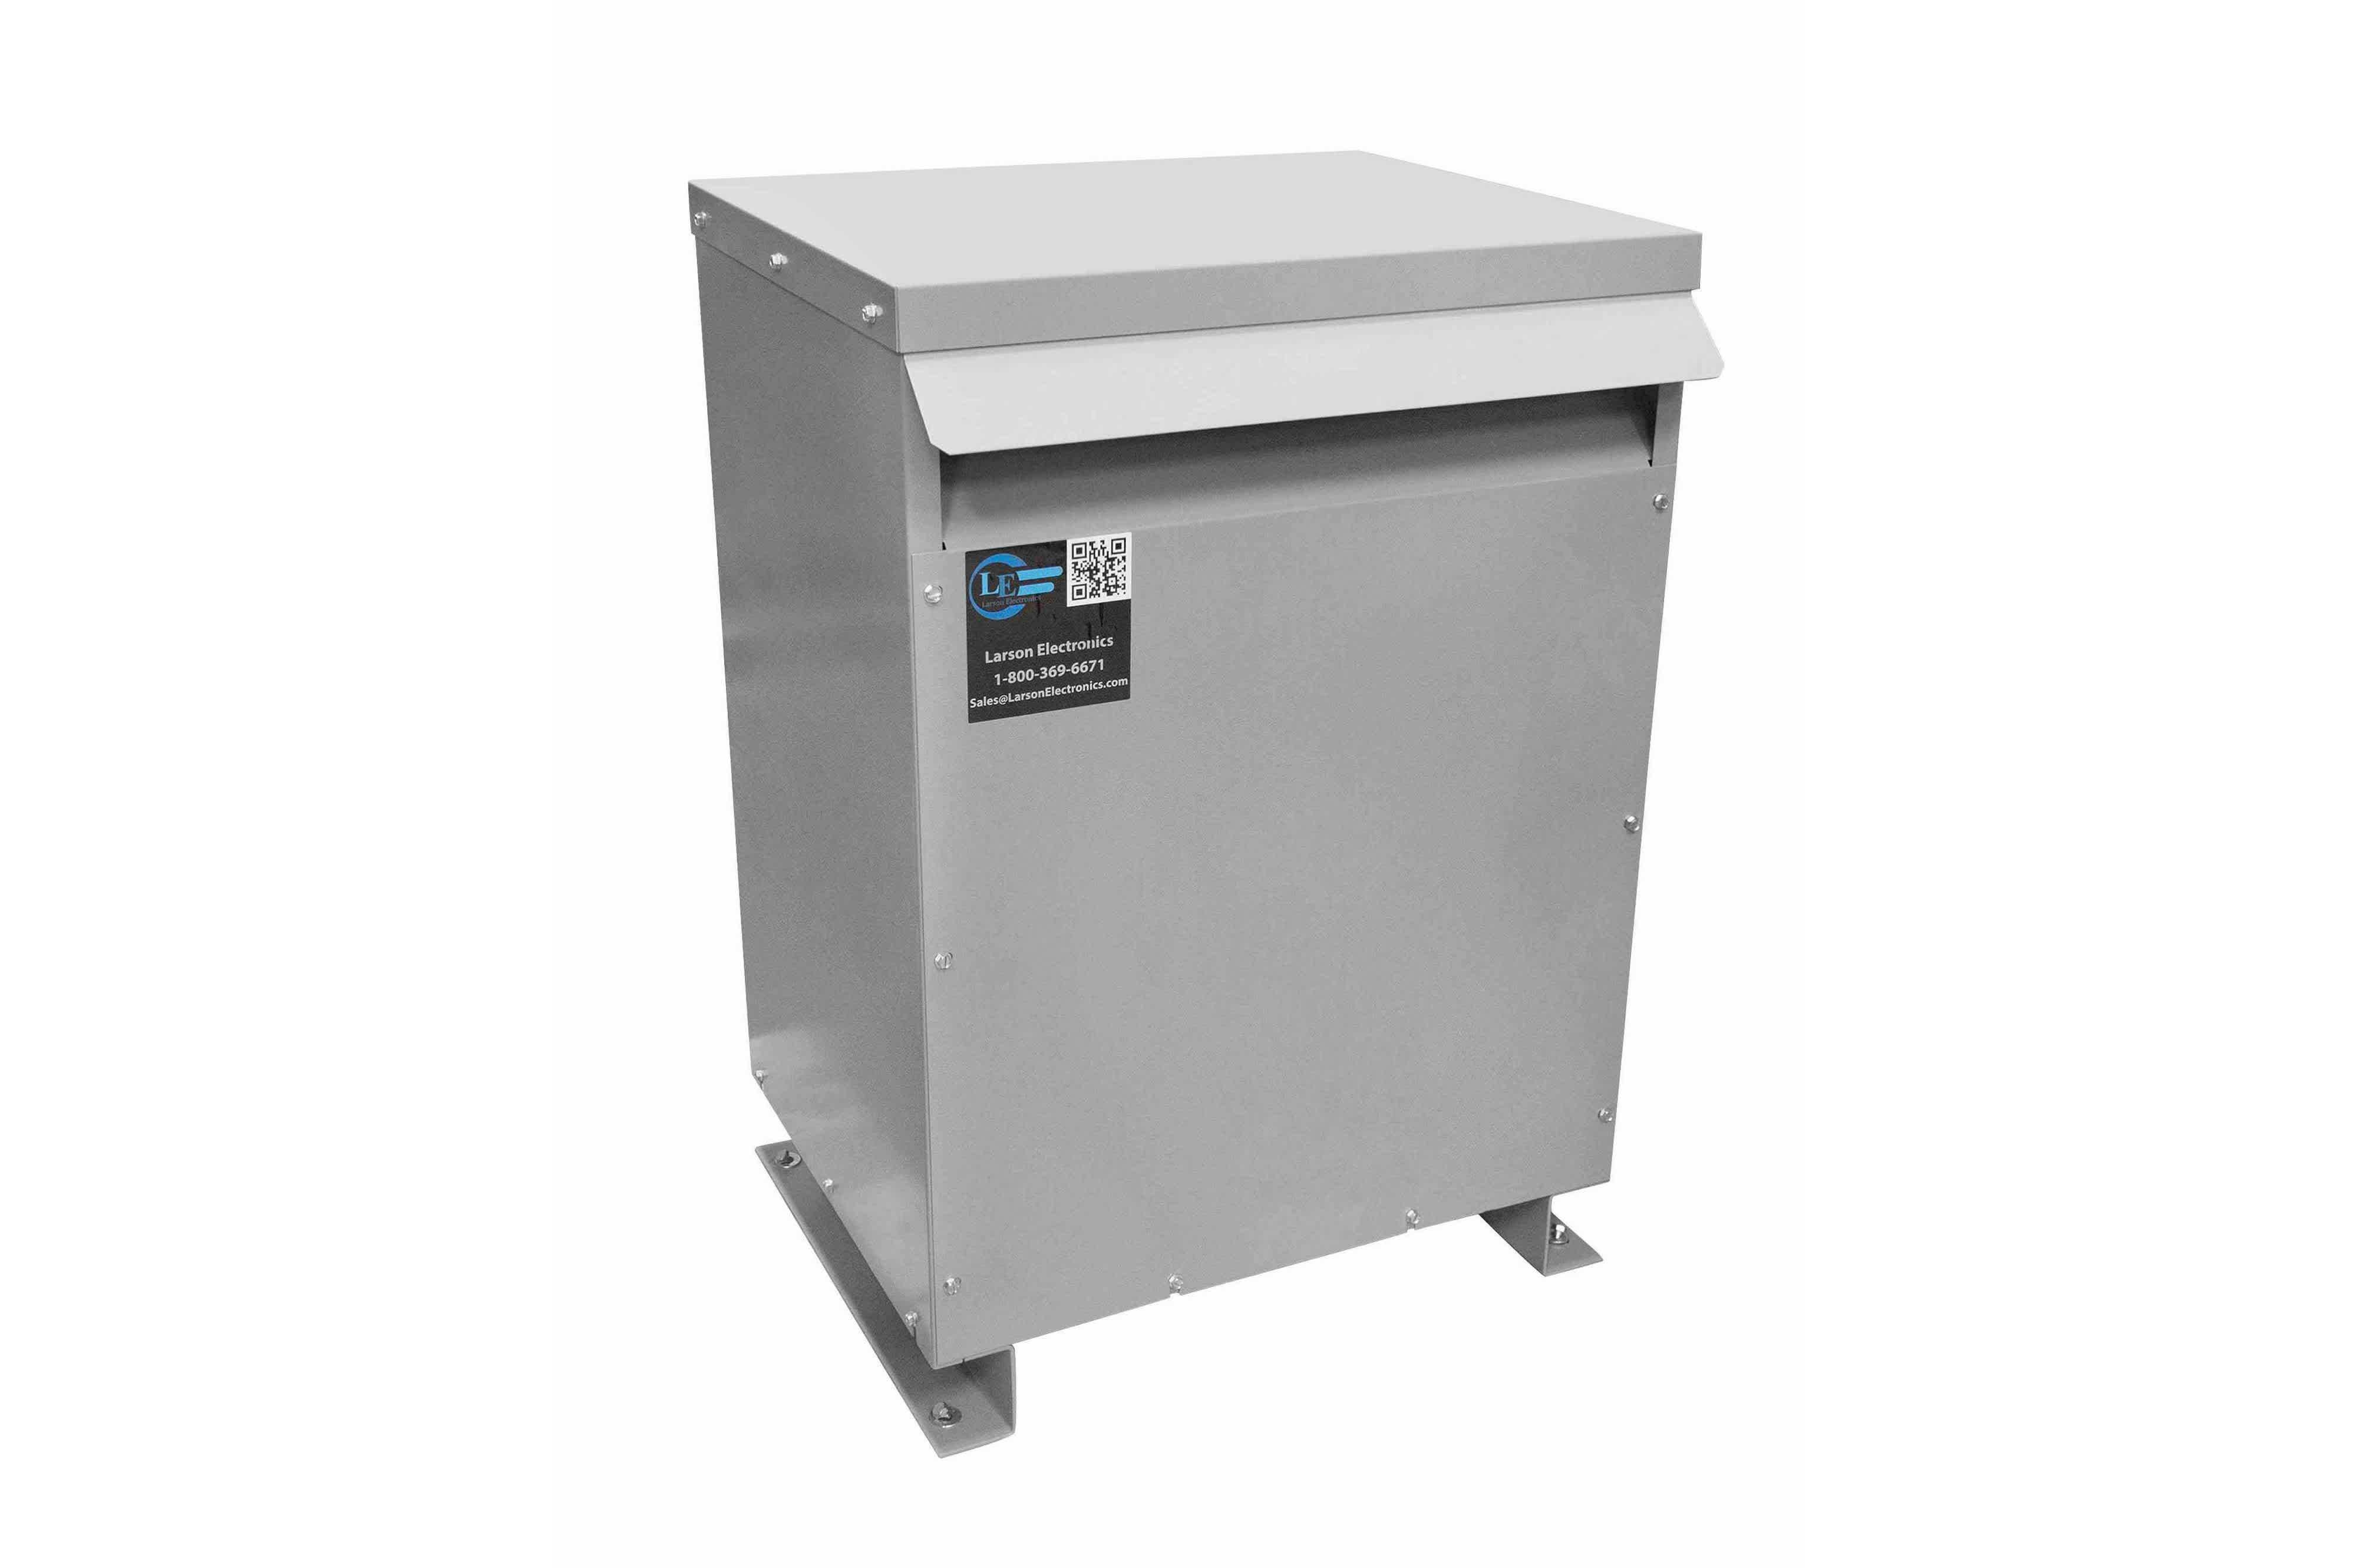 300 kVA 3PH Isolation Transformer, 208V Wye Primary, 600V Delta Secondary, N3R, Ventilated, 60 Hz